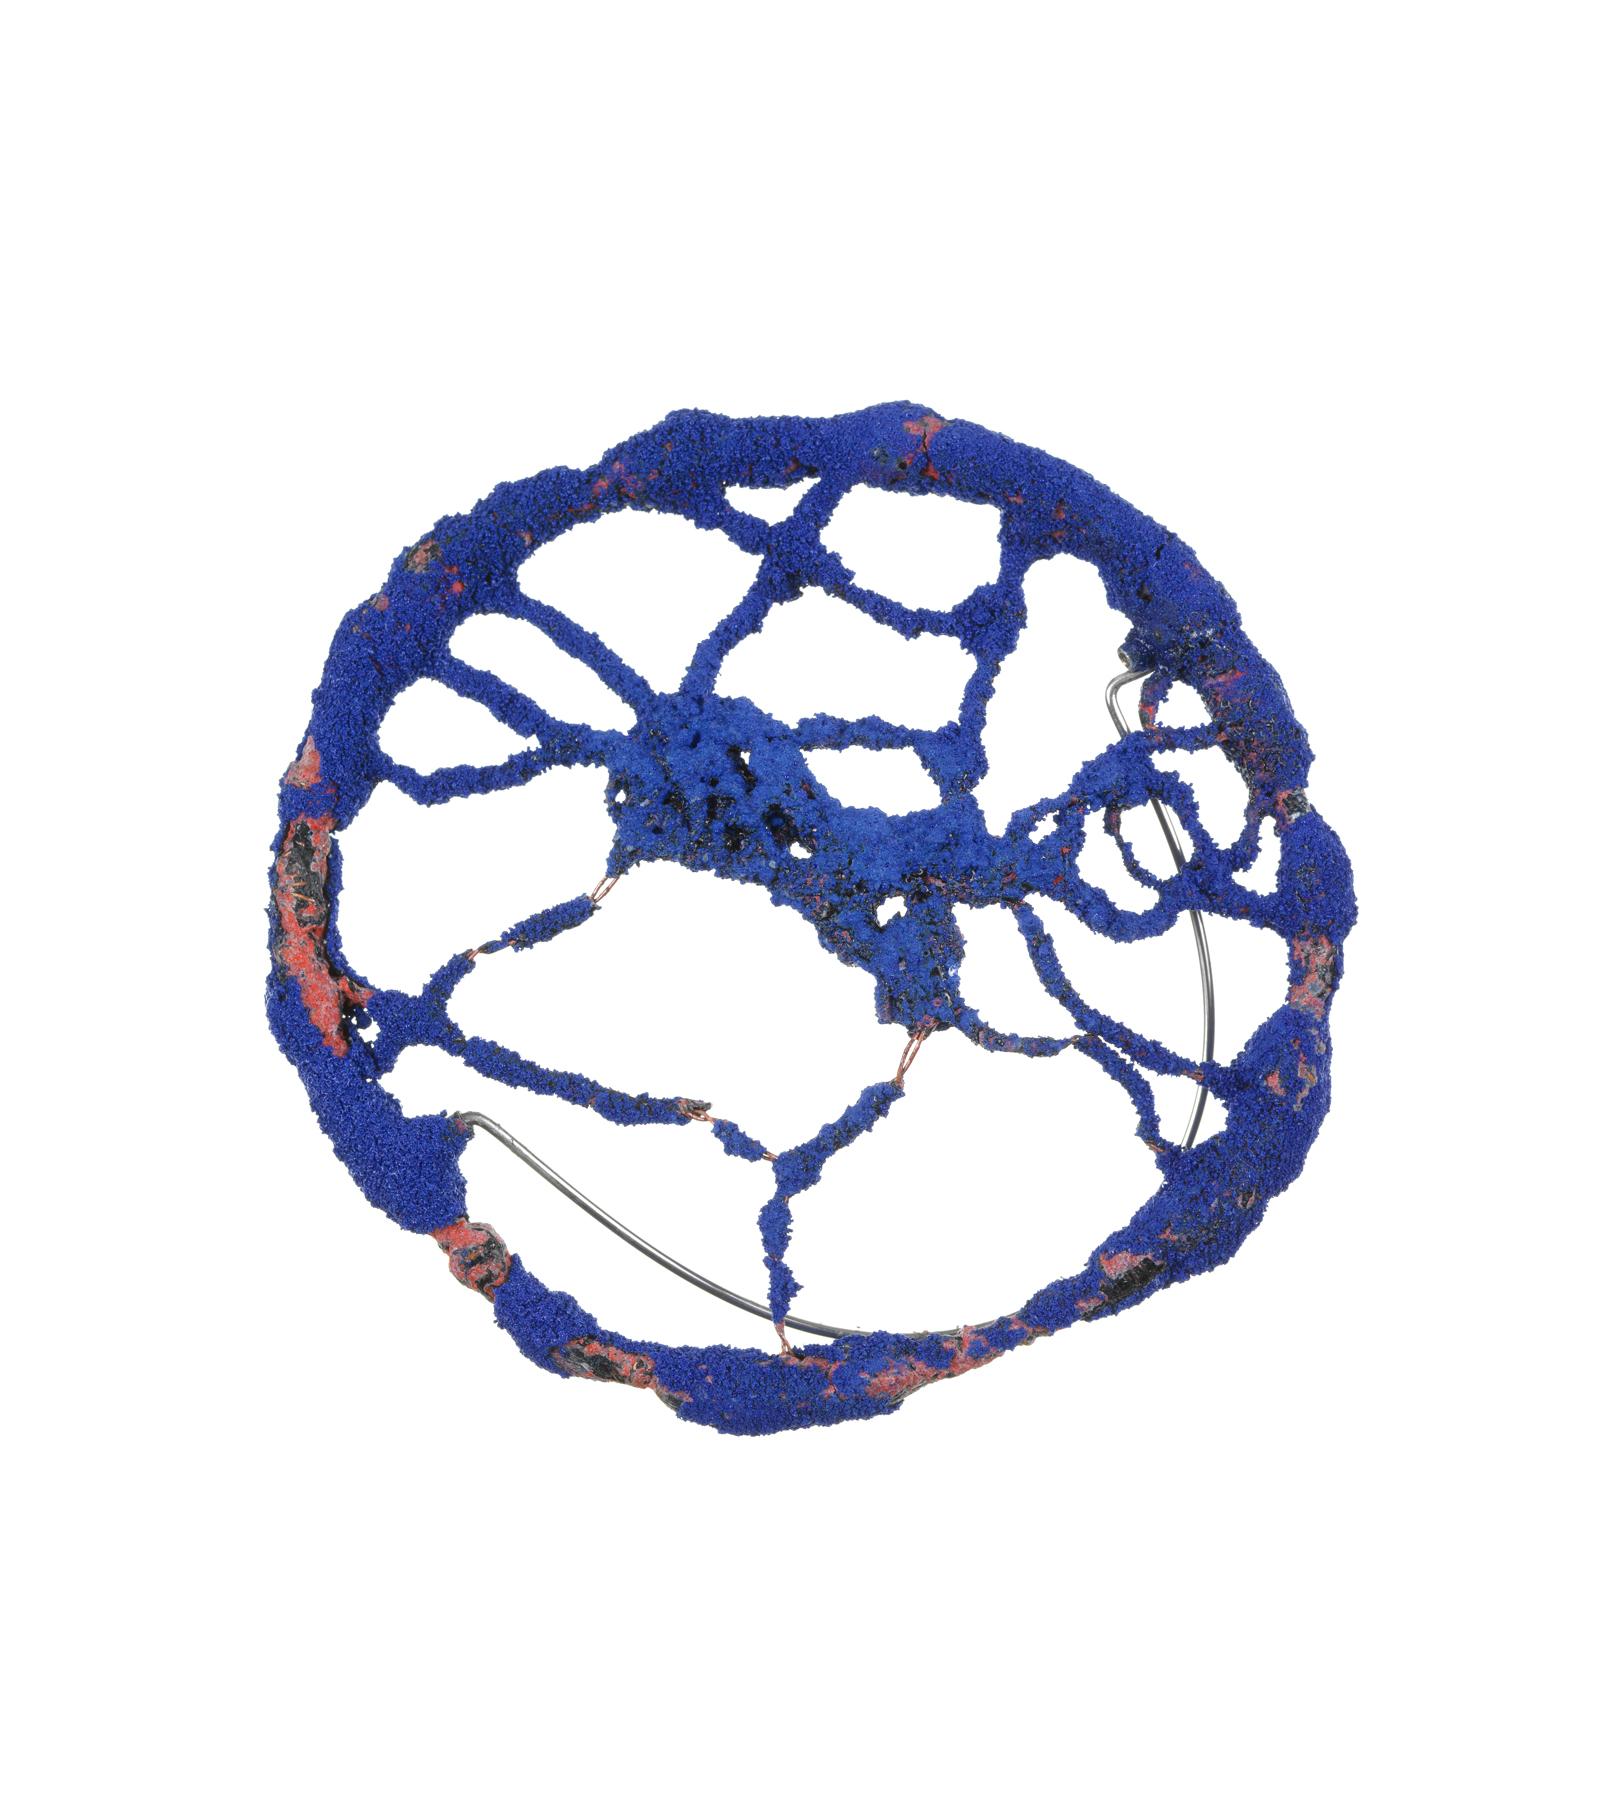 Blue Circle Brooch, 2007